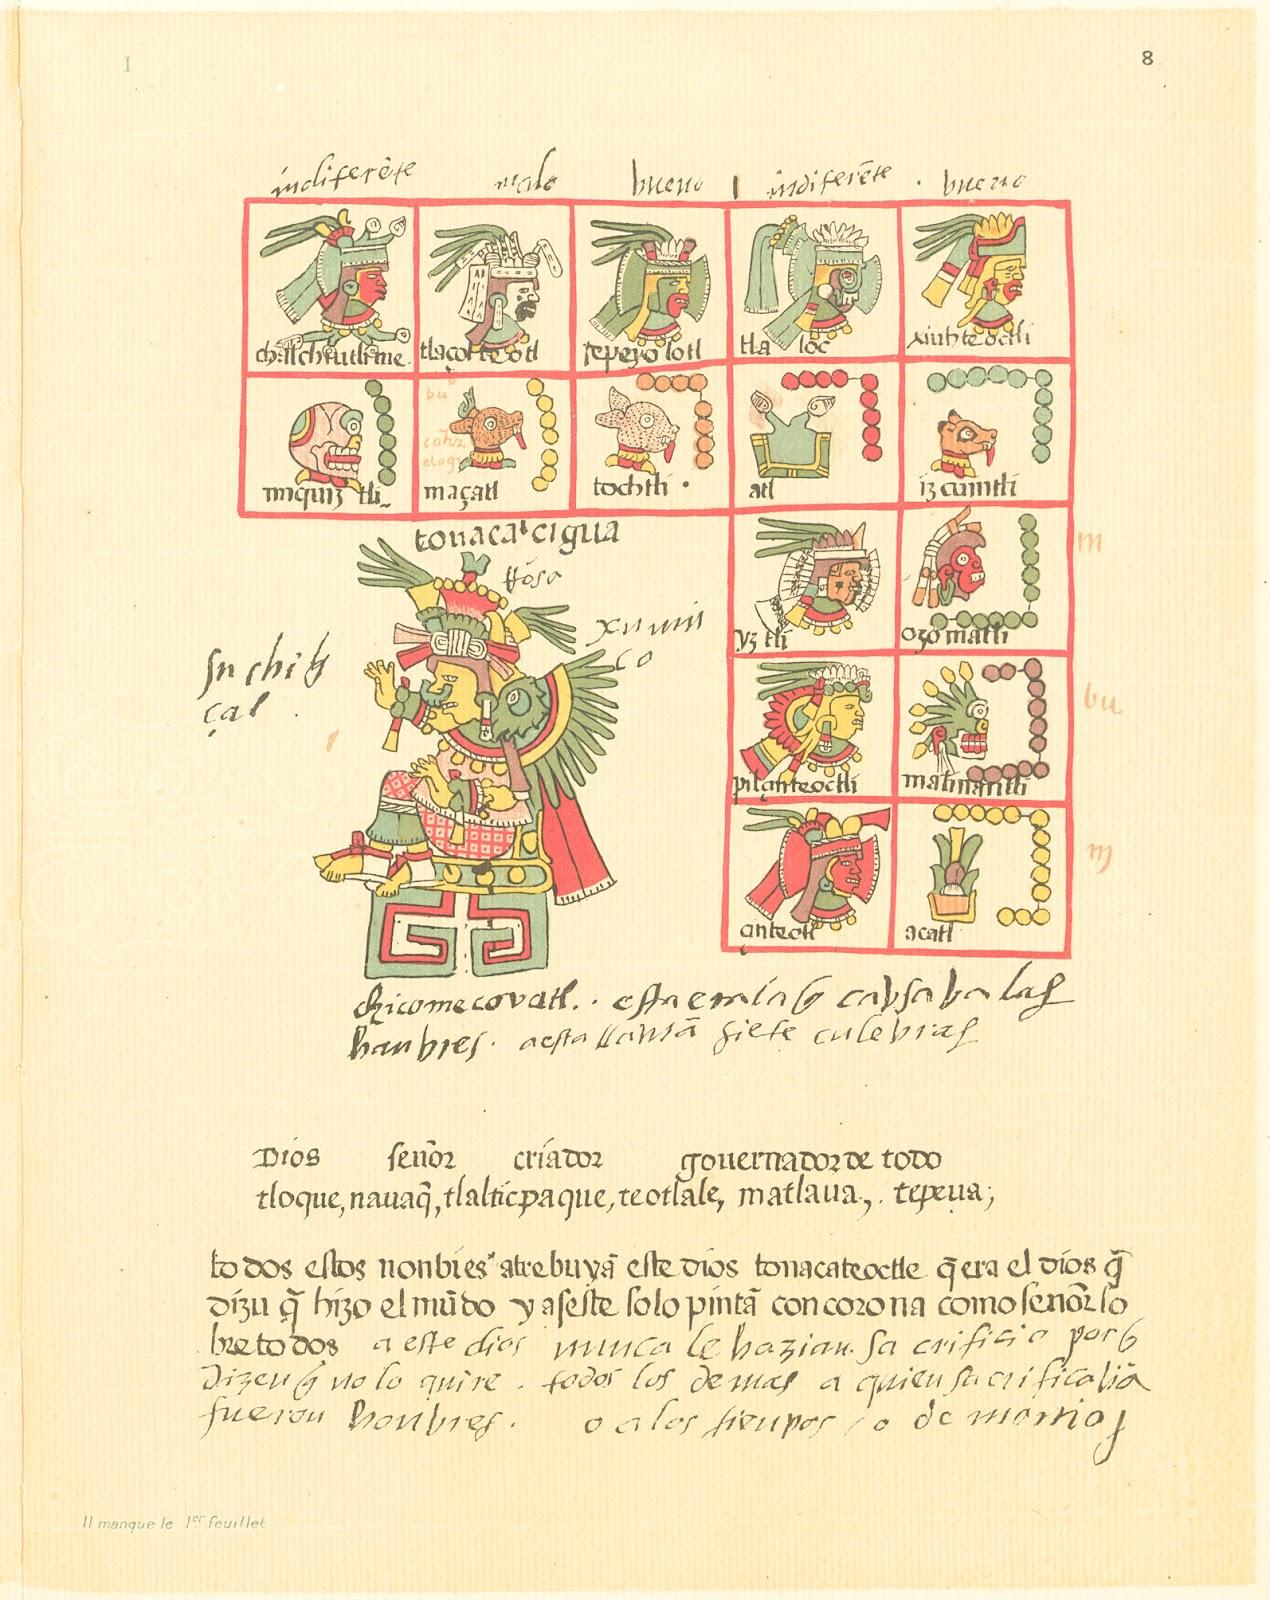 https://upload.wikimedia.org/wikipedia/commons/e/e8/Telleriano-Remensis_(folio_08r).jpg